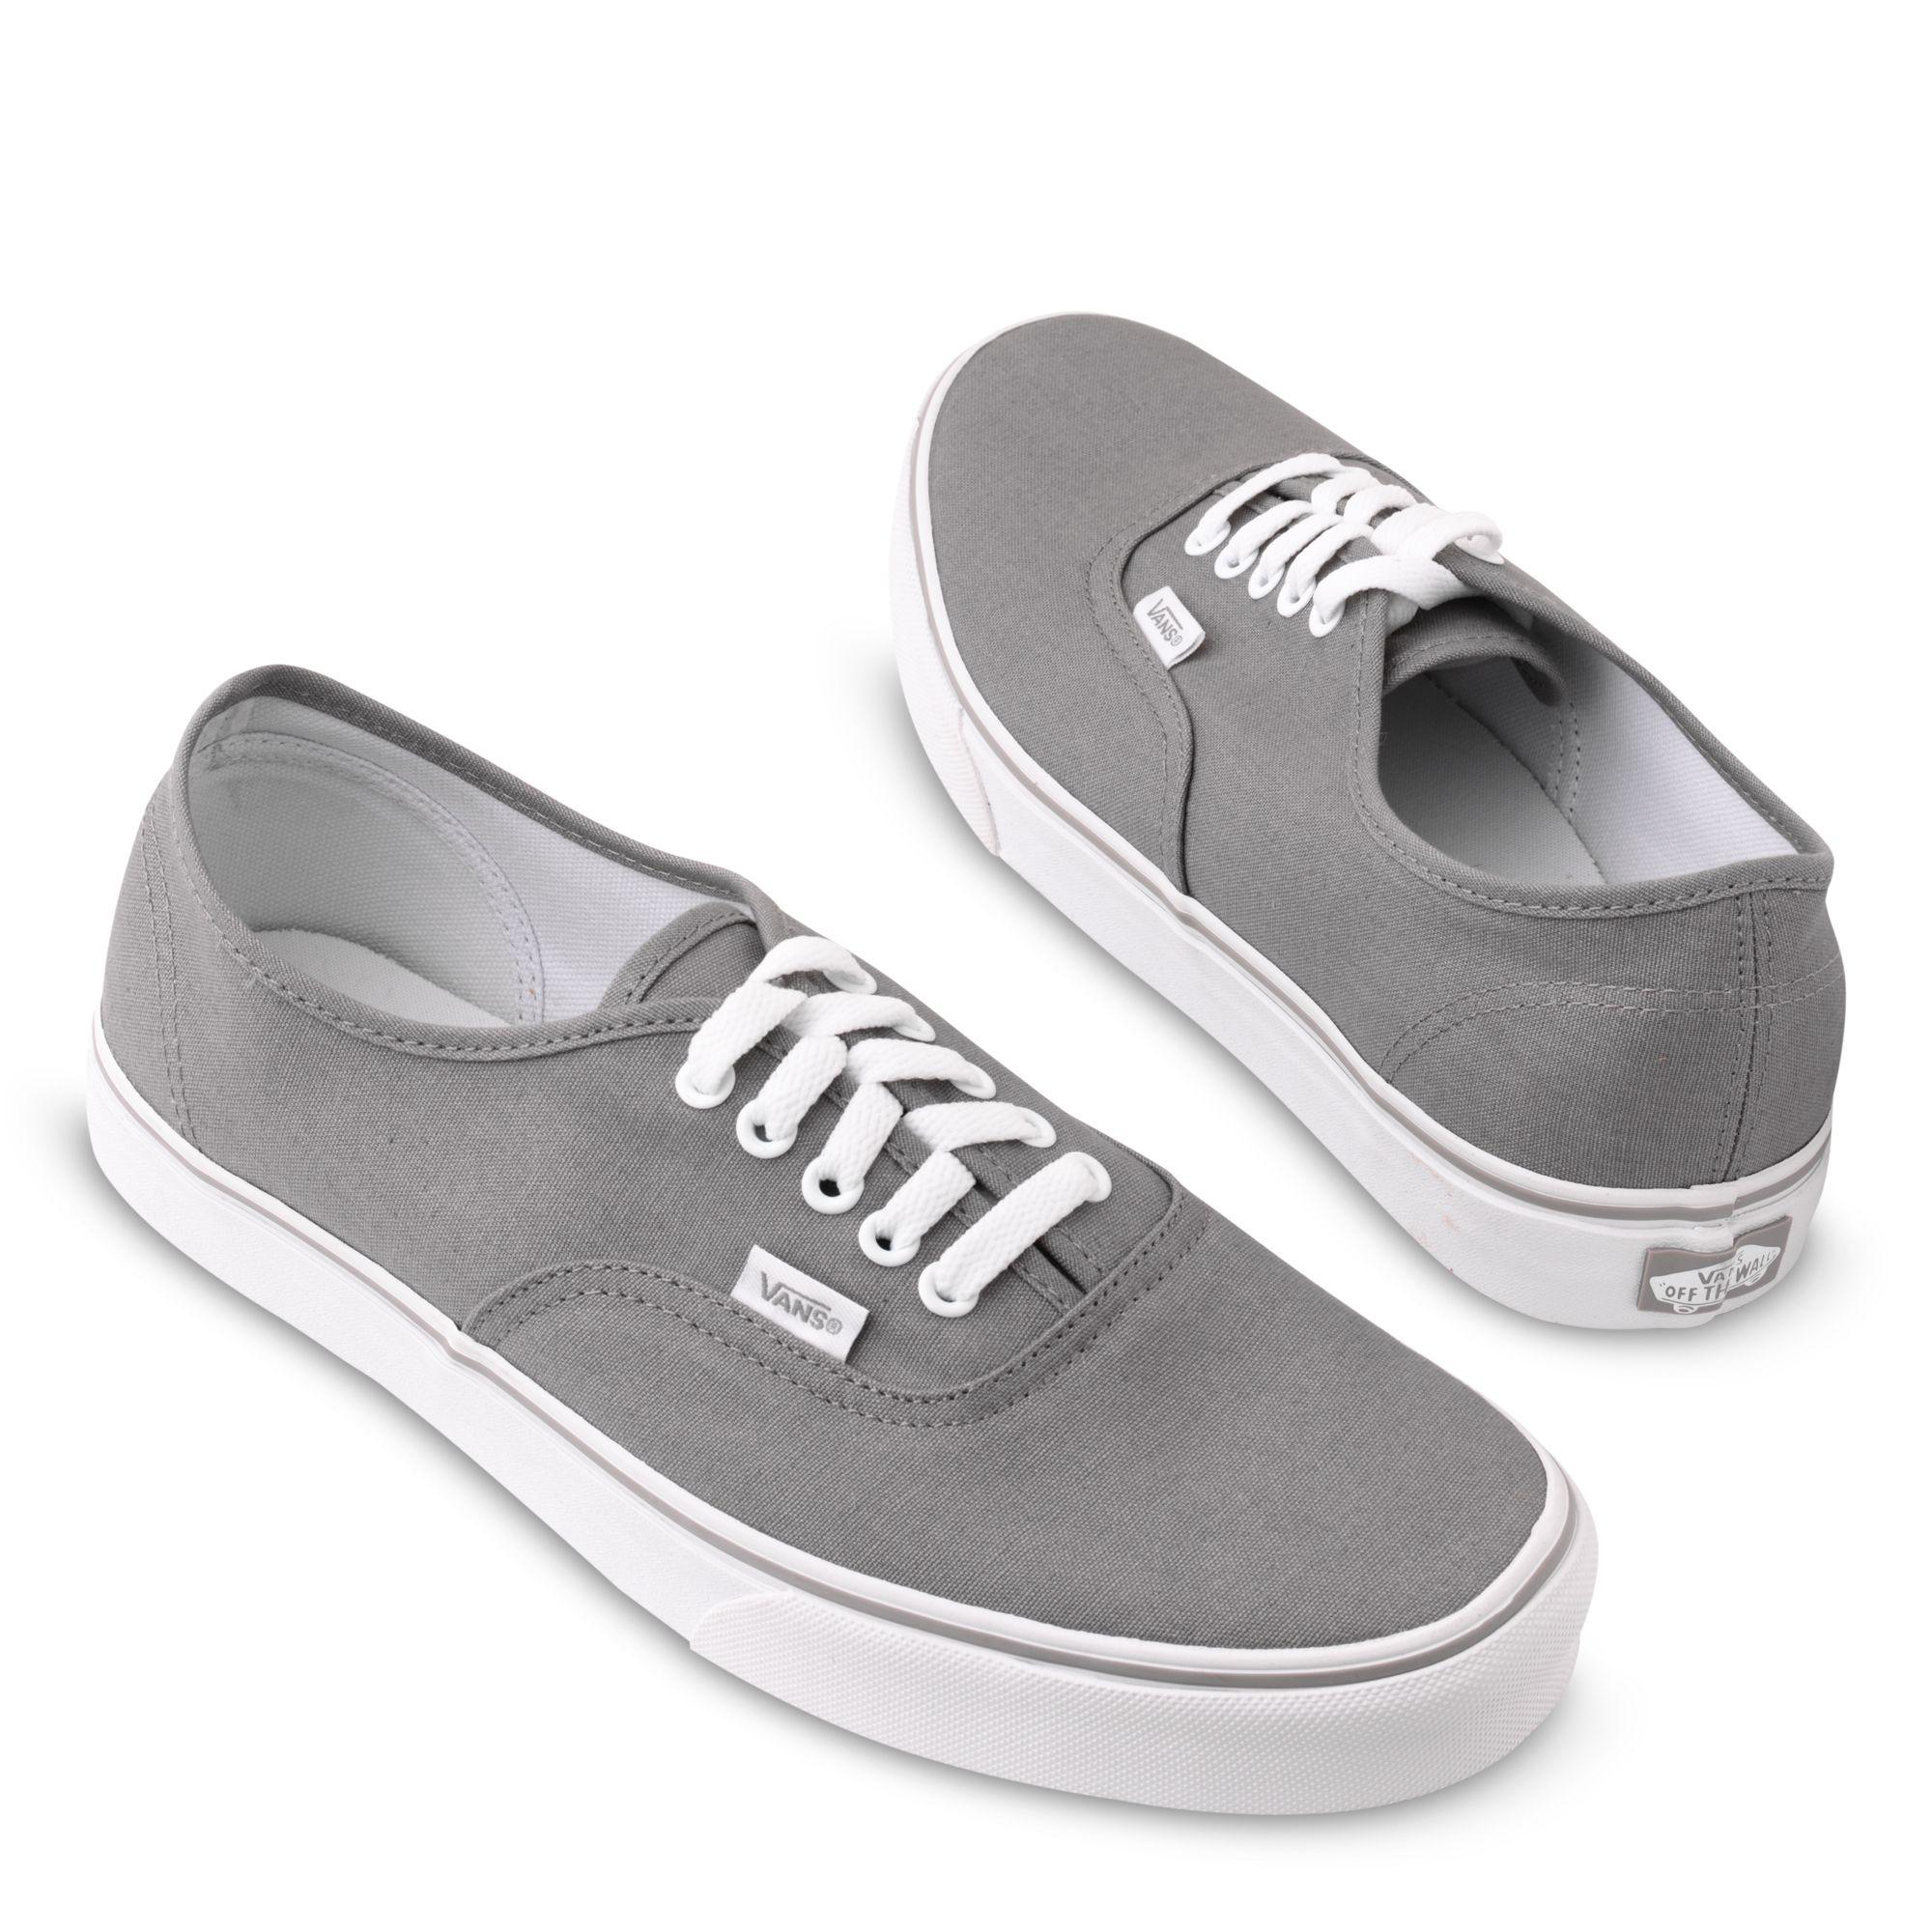 58a5dbb3e977 Vans Authentic Basic Plimsolls in Gray for Men - Lyst